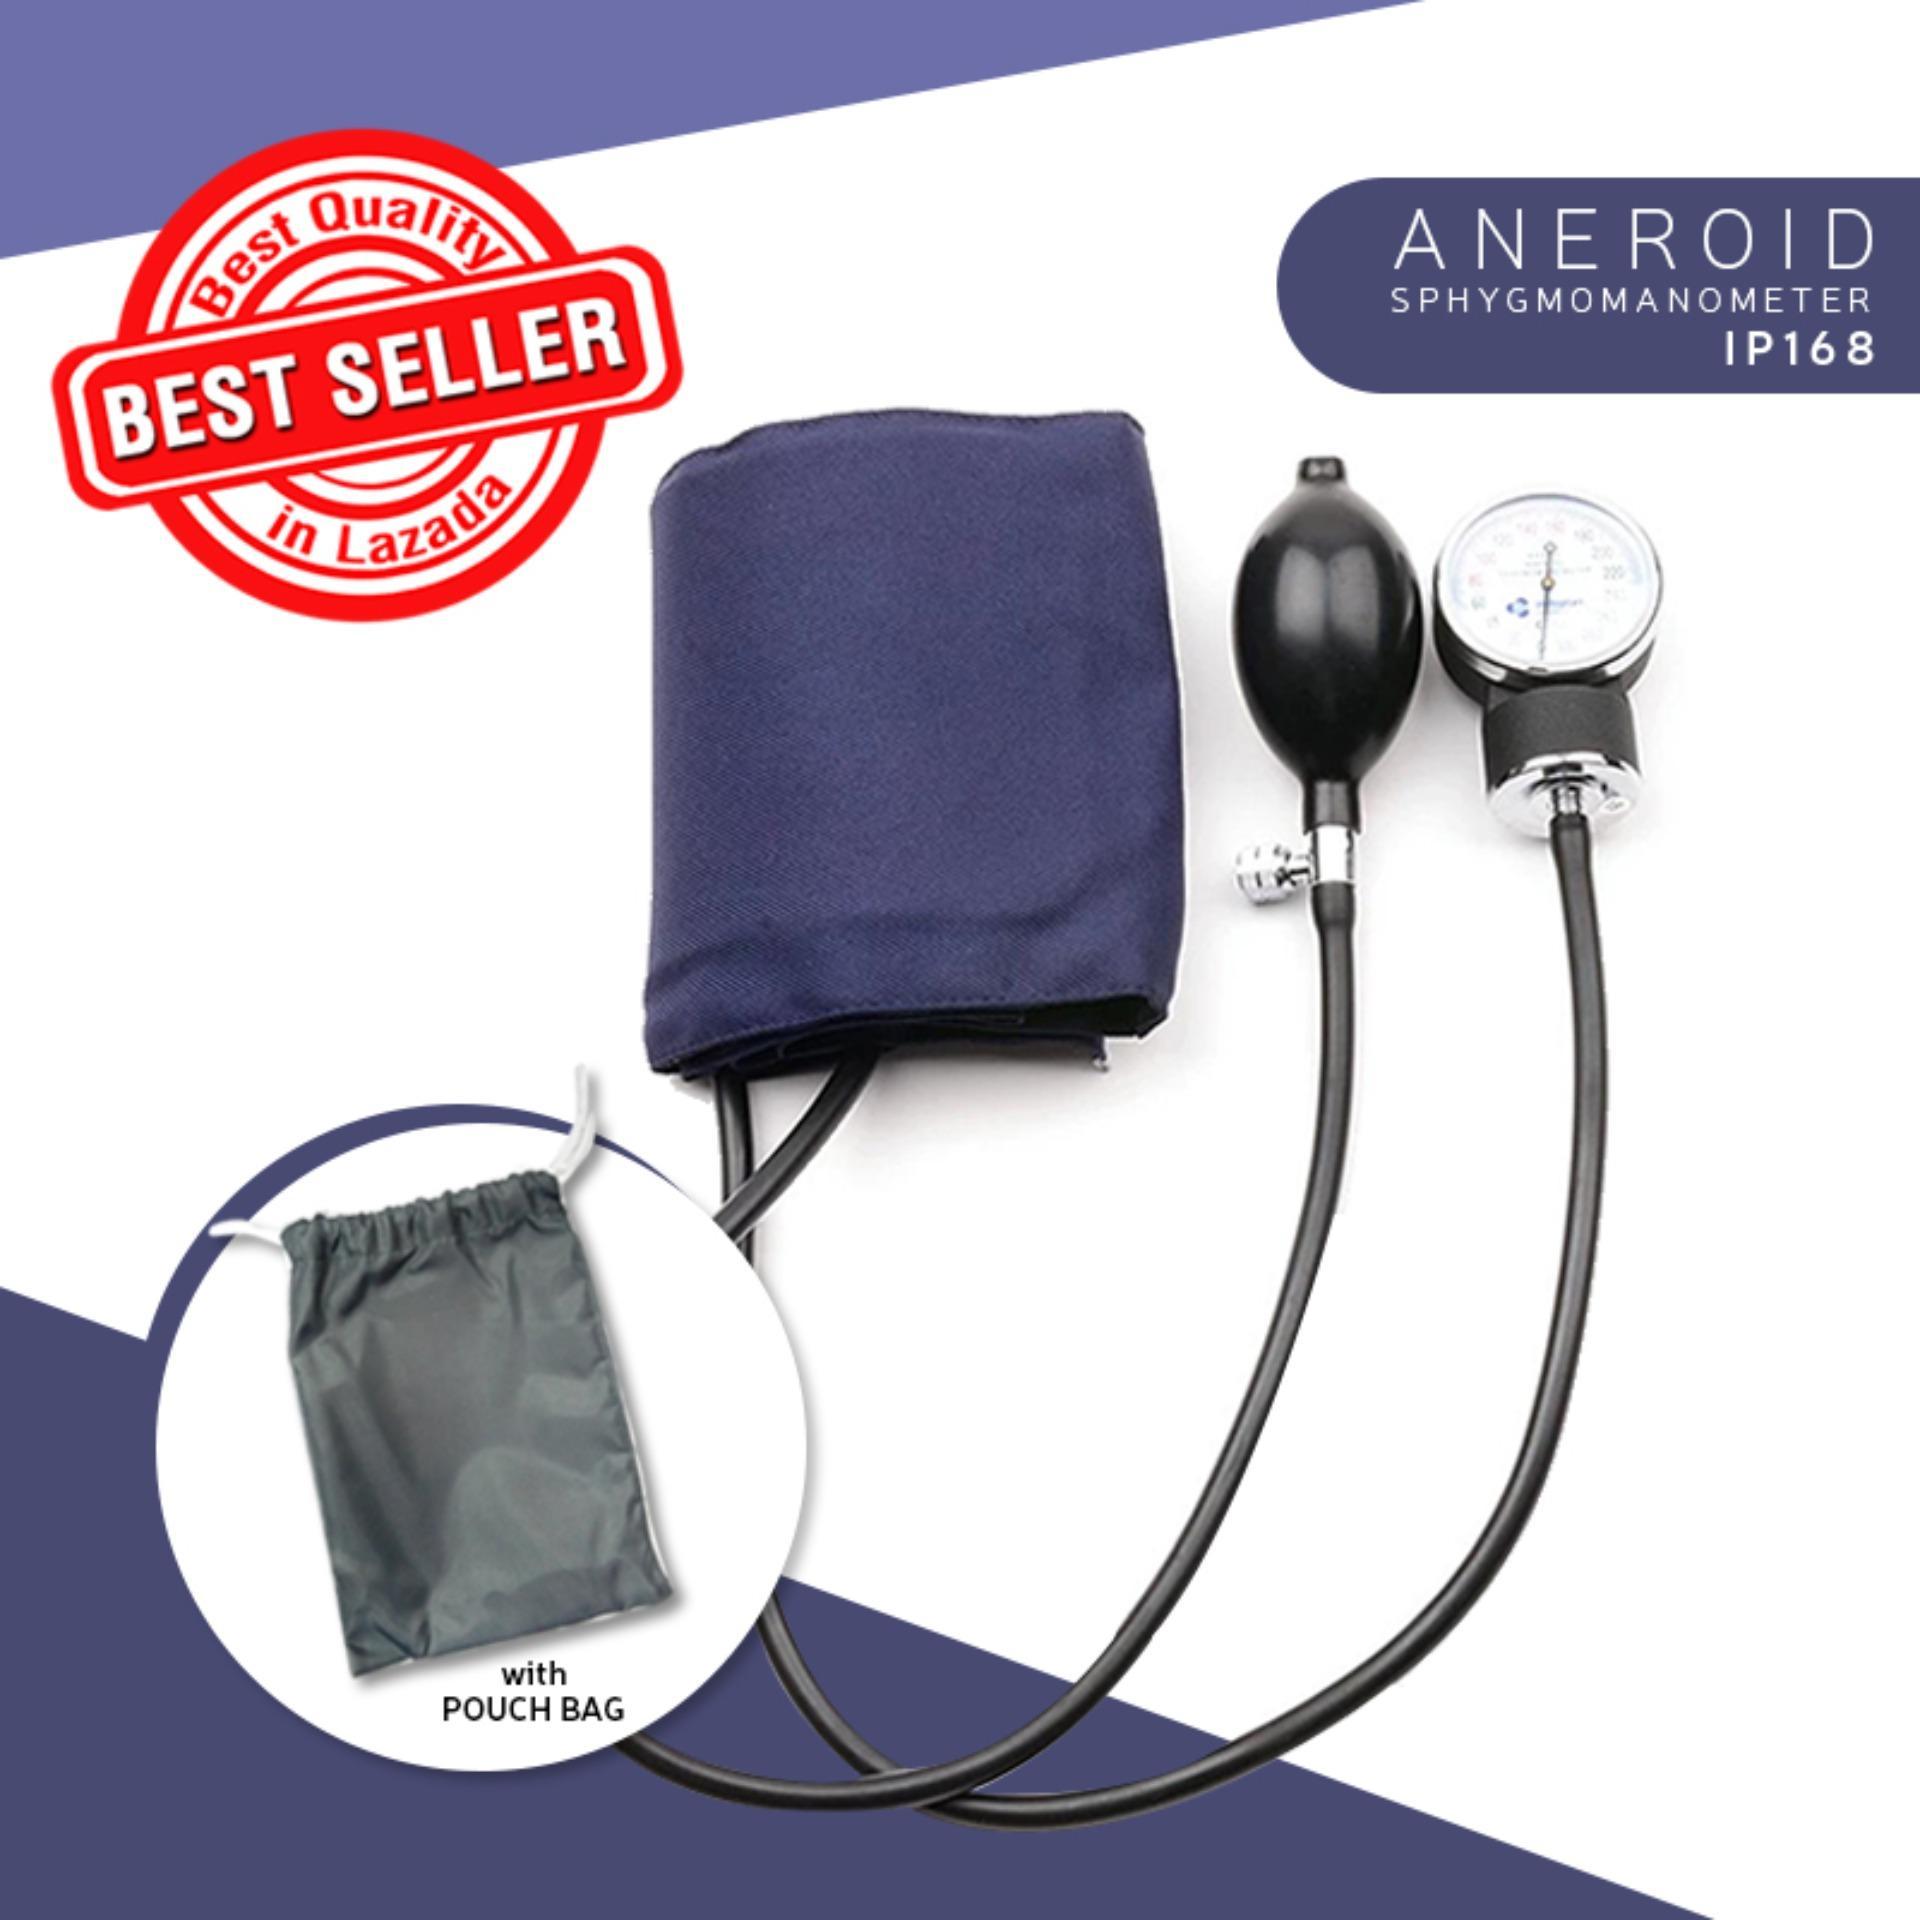 Sphygmomanometer Brands Blood Pressure Monitor On Sale Prices Prestige Car Alarm Wiring Diagram Indoplas Aneroid